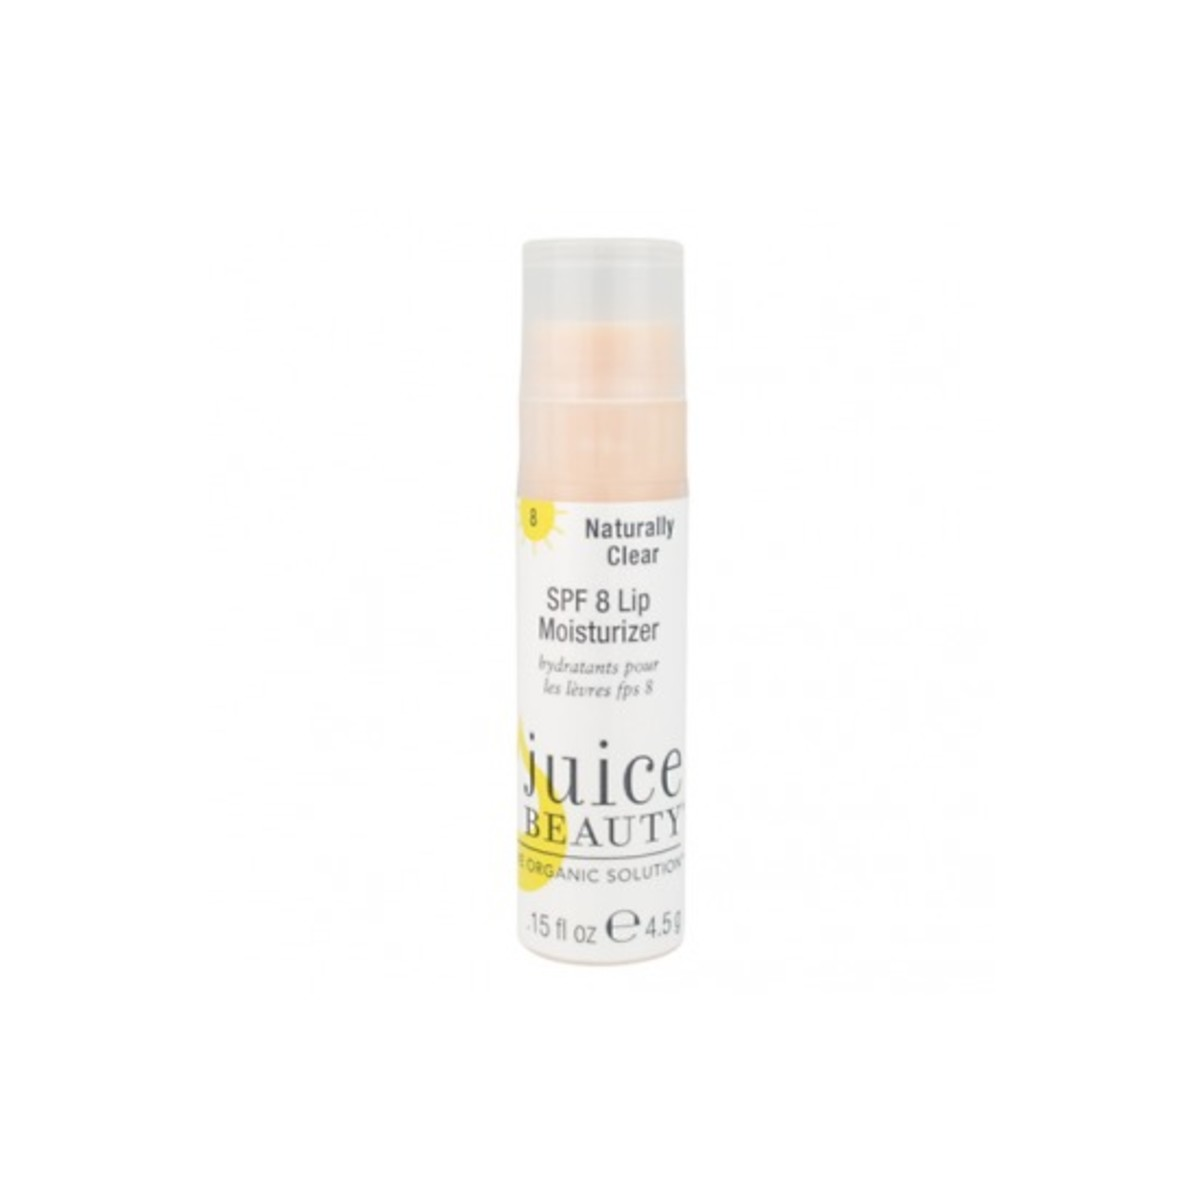 Juice Beauty SPF 8 Lip Moisturizer - Naturally Clear